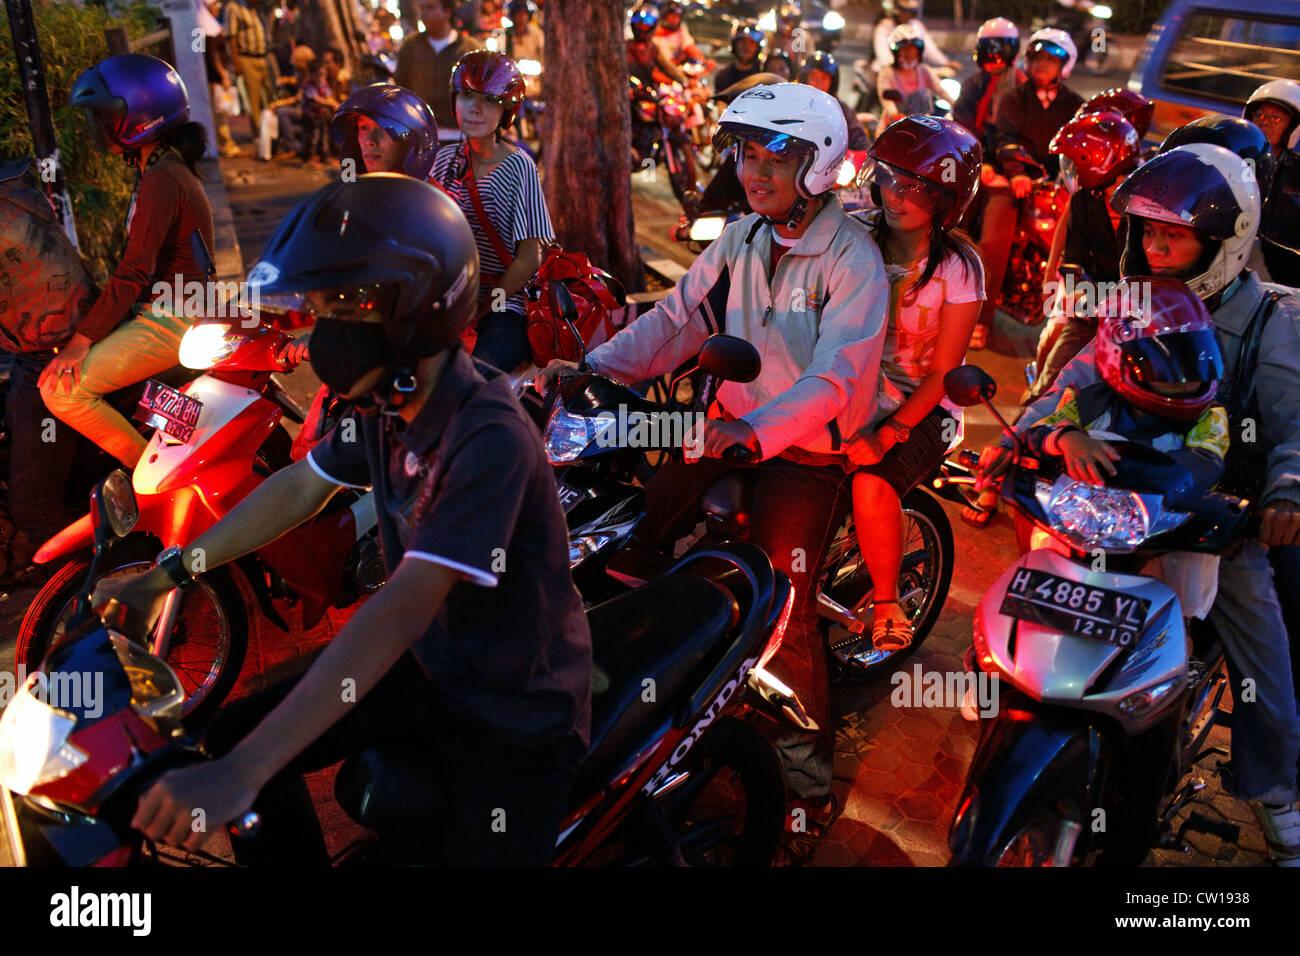 People on motorbikes at night in Surabaya, Indonesia. - Stock Image